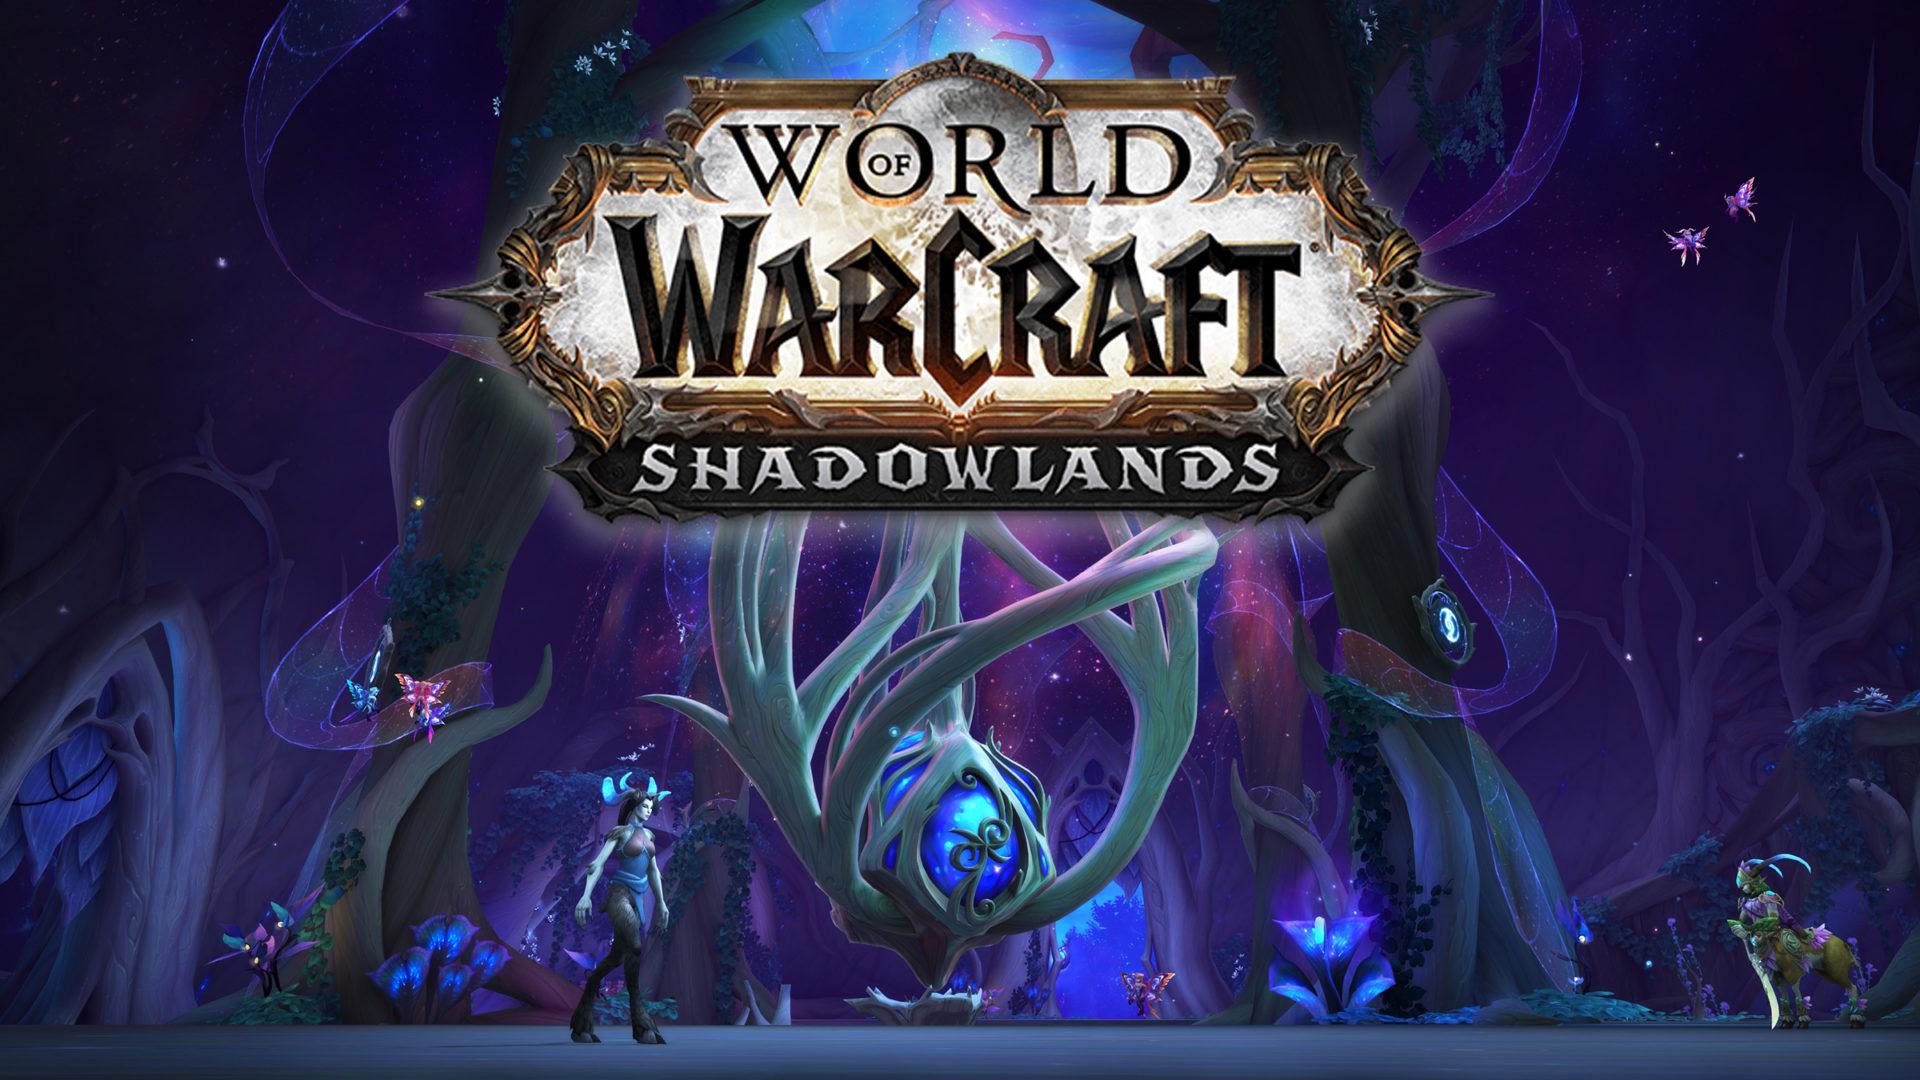 World of Warcraft Shadowlands Covenants